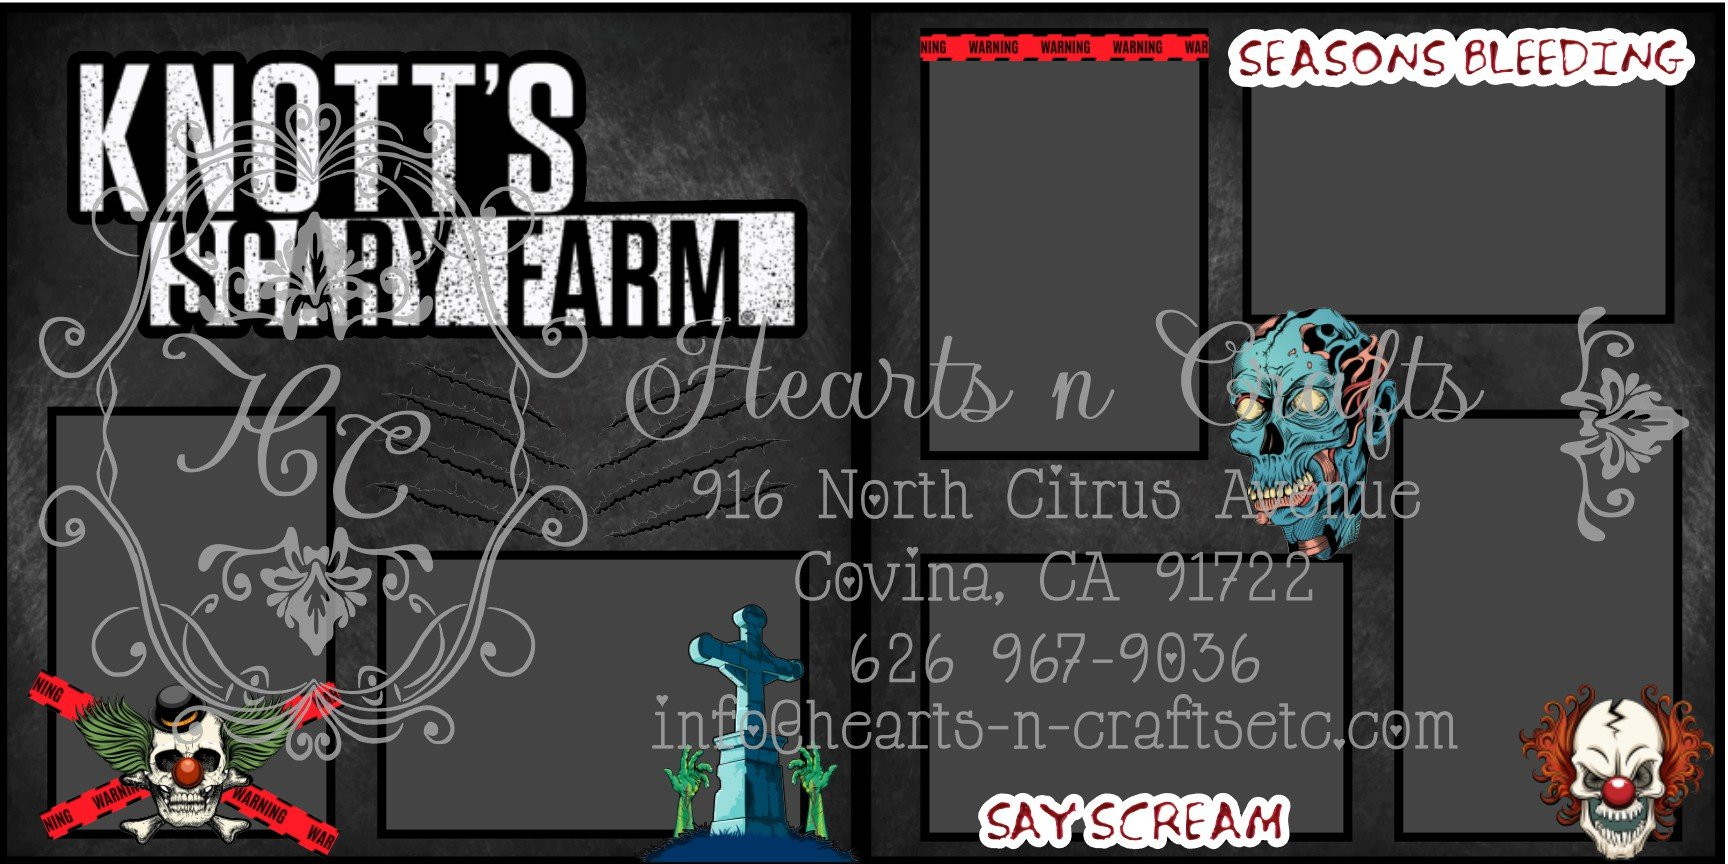 Knotts Scary Farm 2 Page Layout